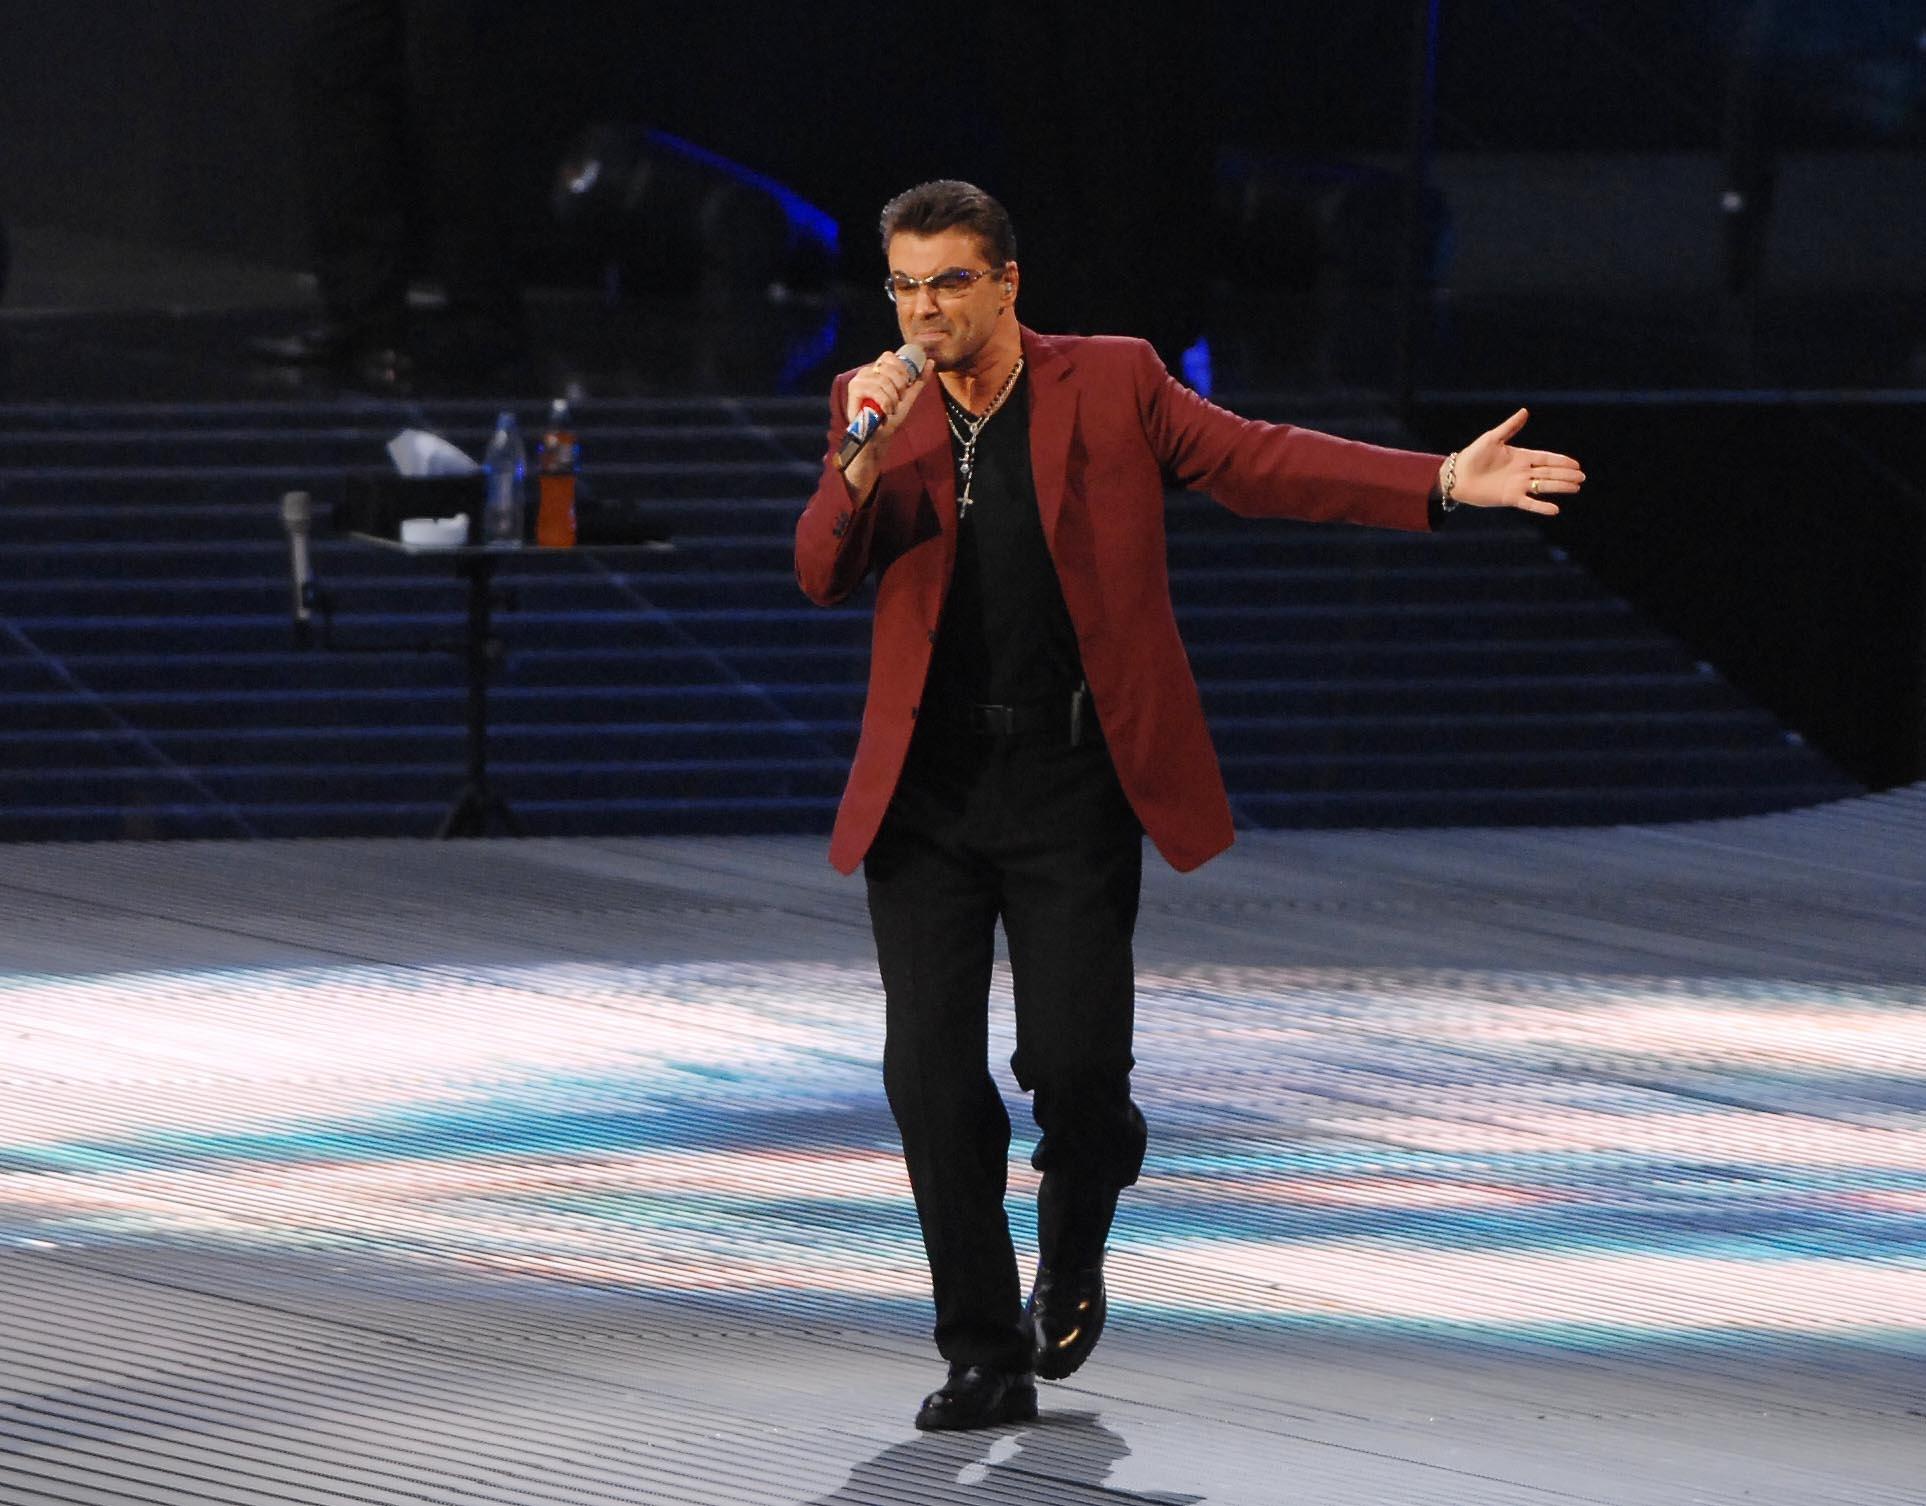 Uk - Gerorge Michael Performs at Wembley Stadium